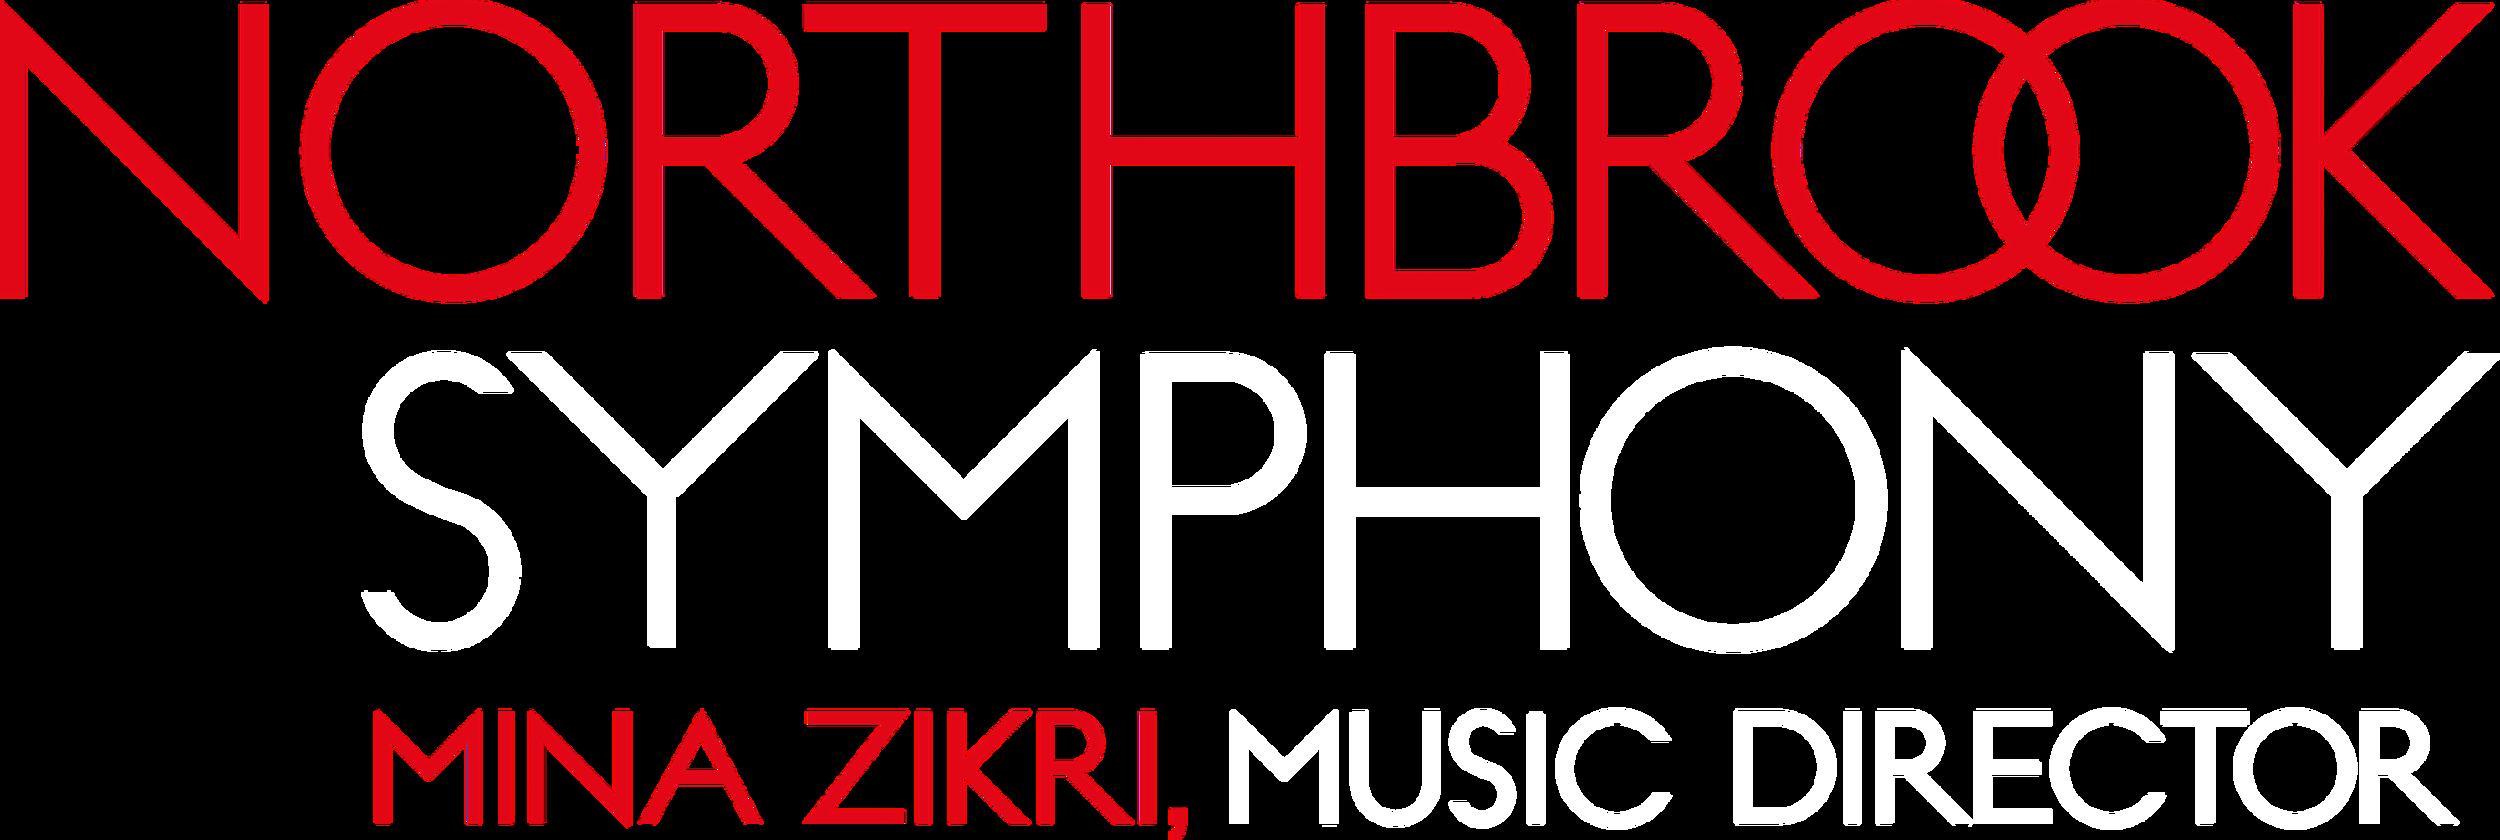 Northbrook Name only logo_lock up_rgb_mina_zikri red white 60 percent size.png